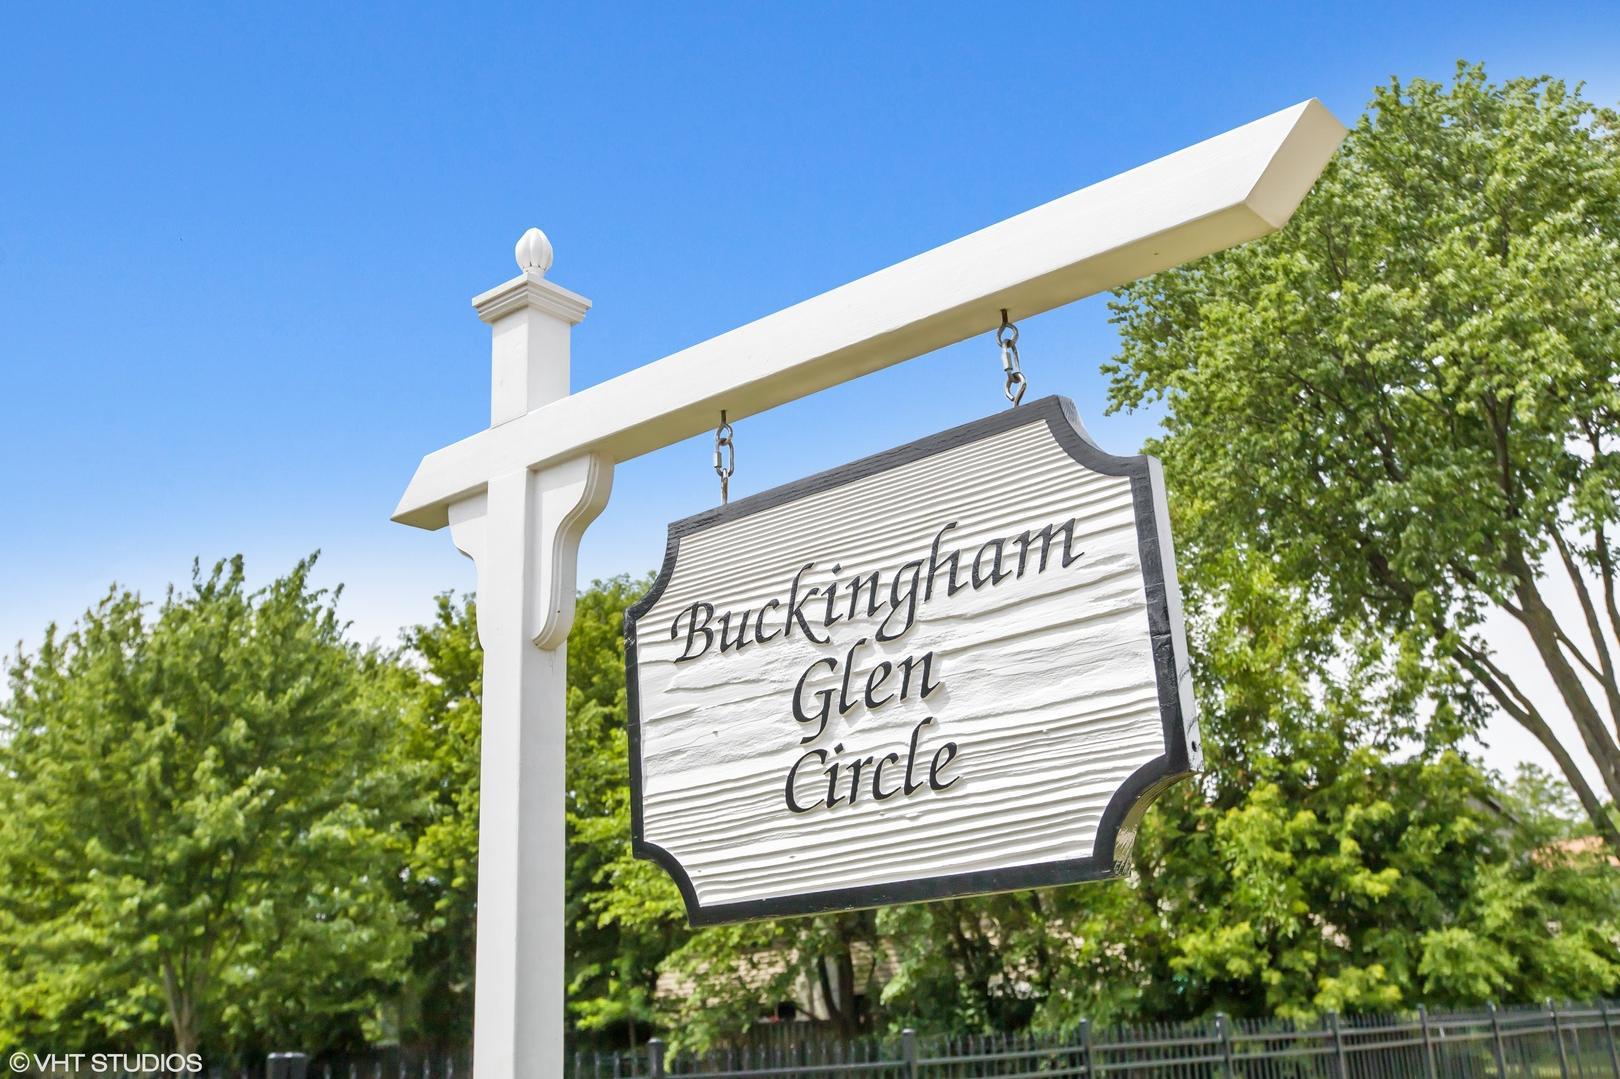 1532 Buckingham Glen  Circle preview